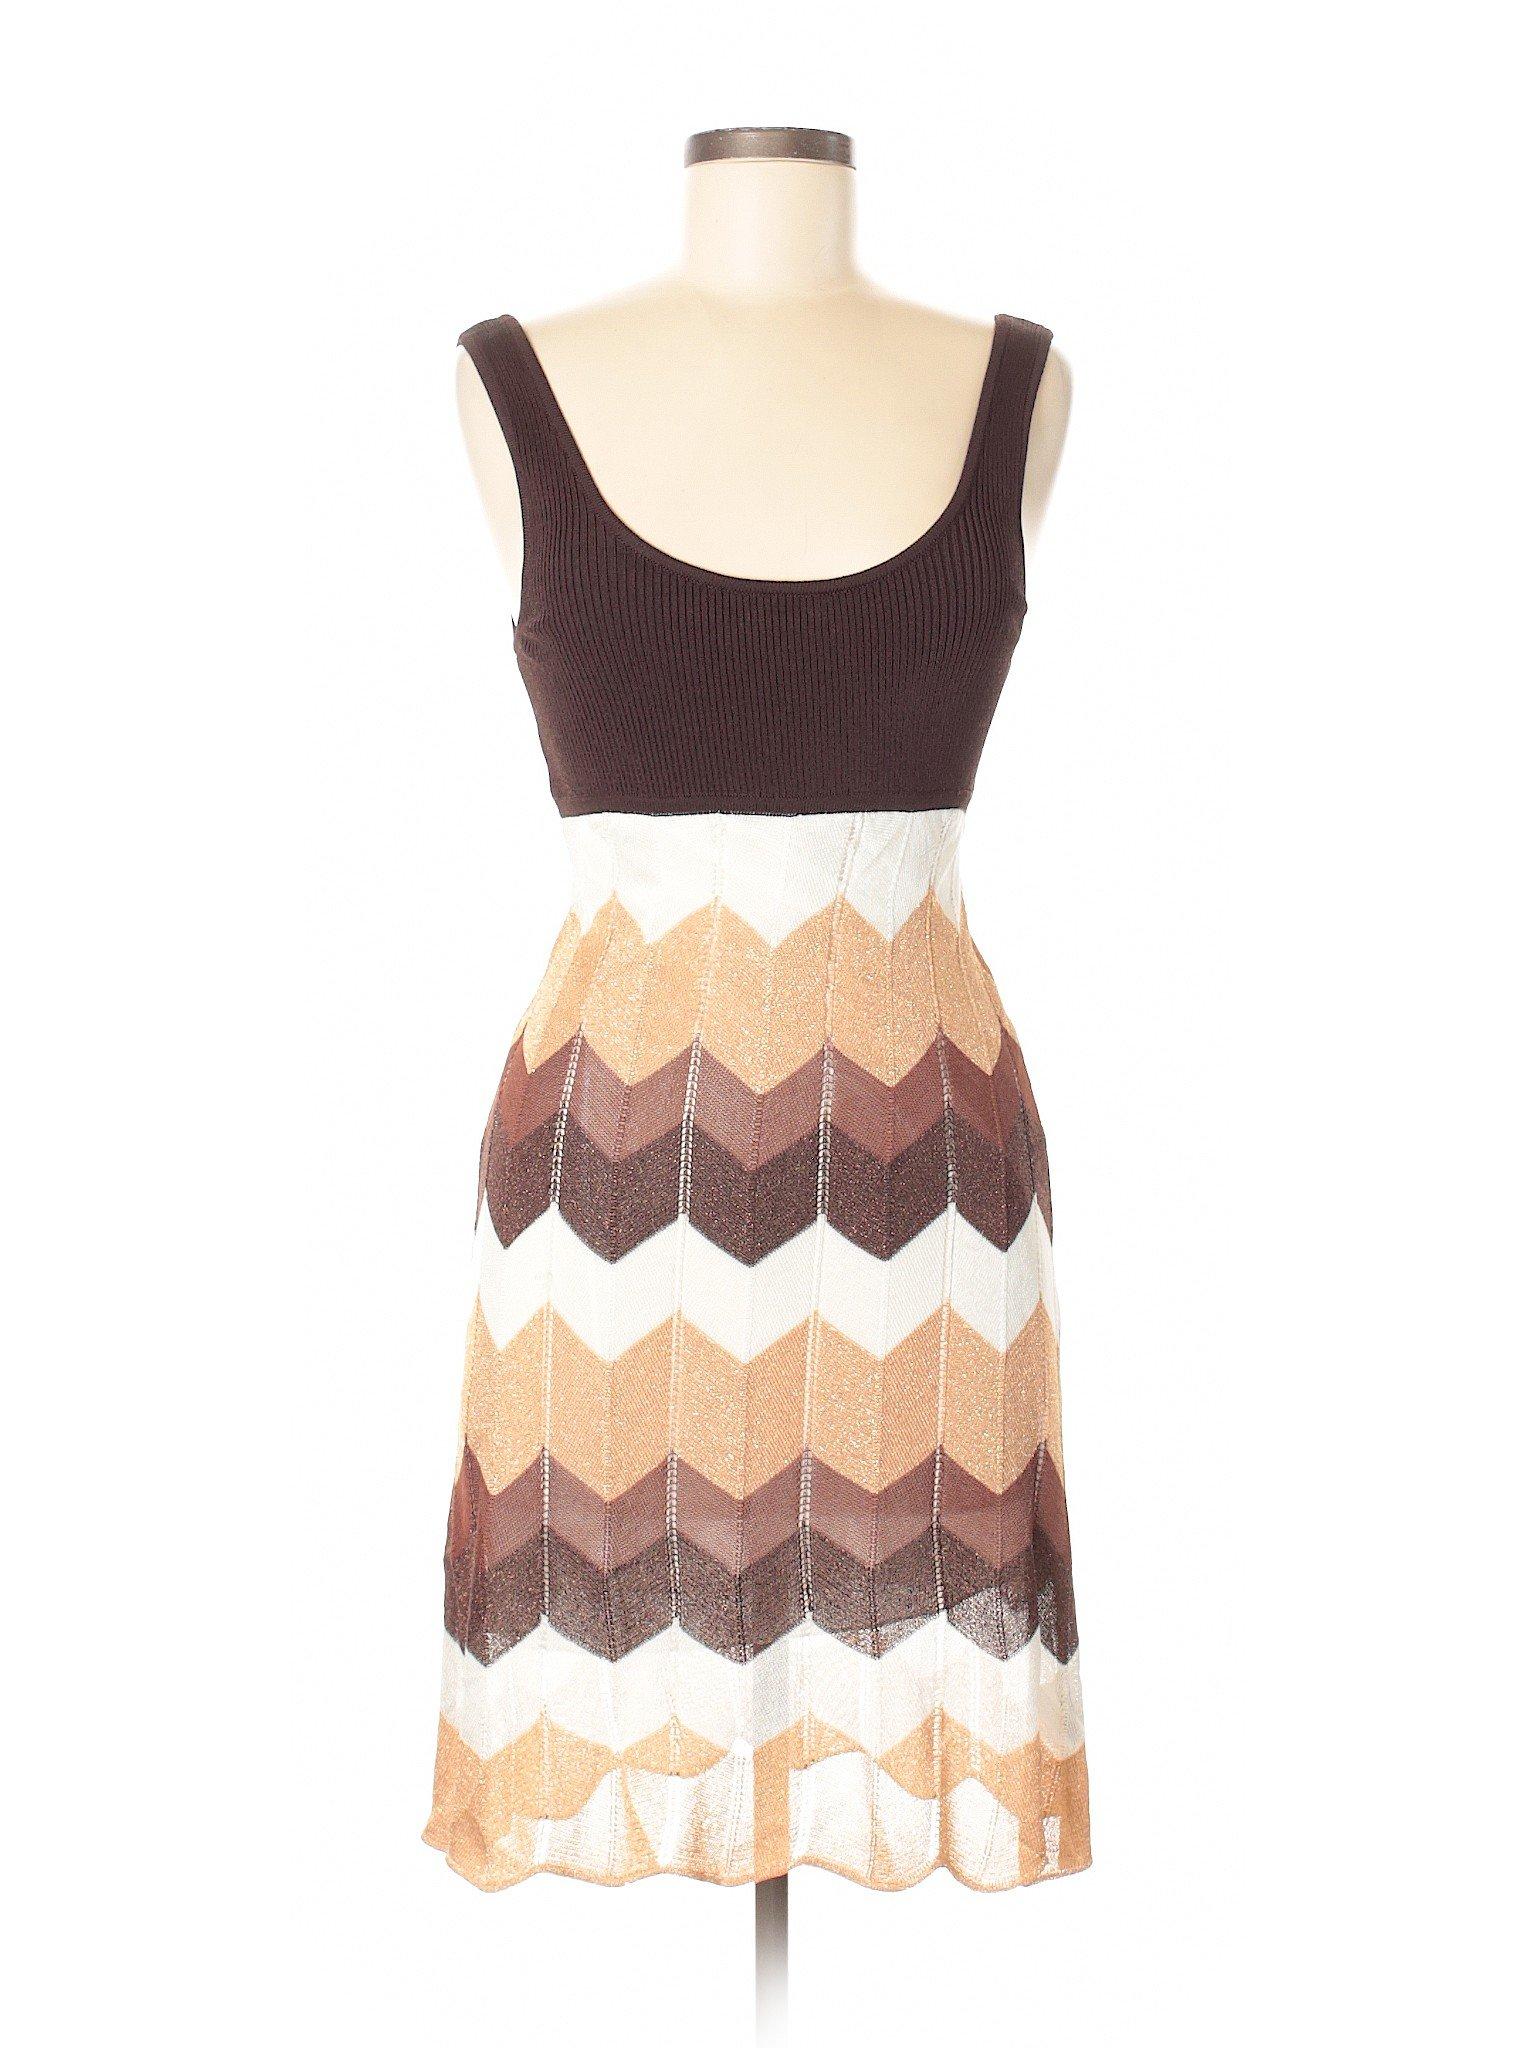 Bebe Boutique Dress Boutique Casual winter Casual Dress Bebe winter dvqC6aw